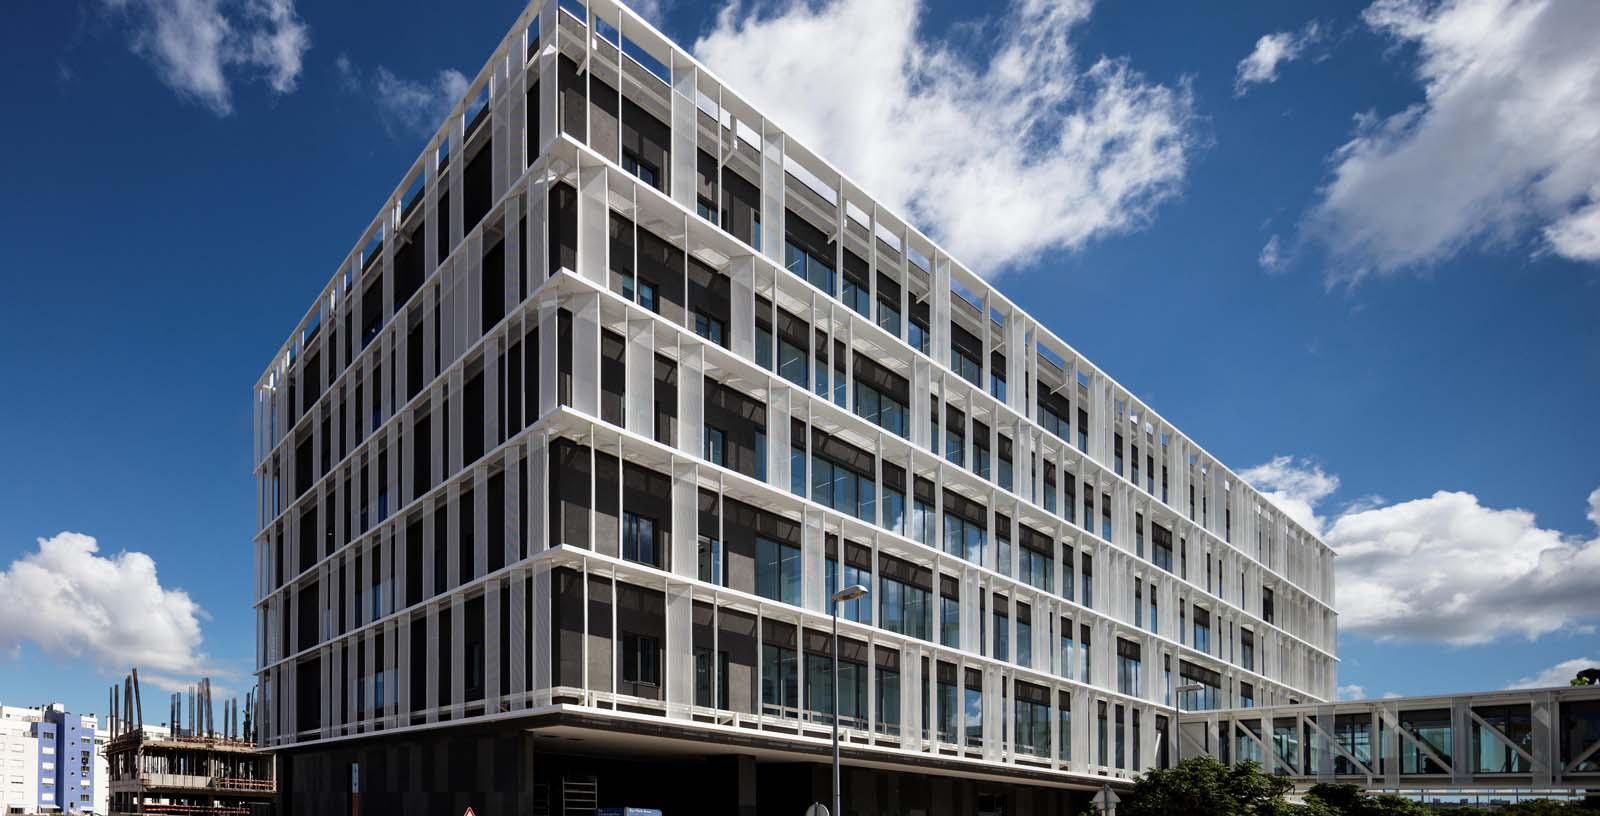 Cuf_Descobertas_Hospital_Architecture_01_IDOM_copyright_Fernando_Guerra